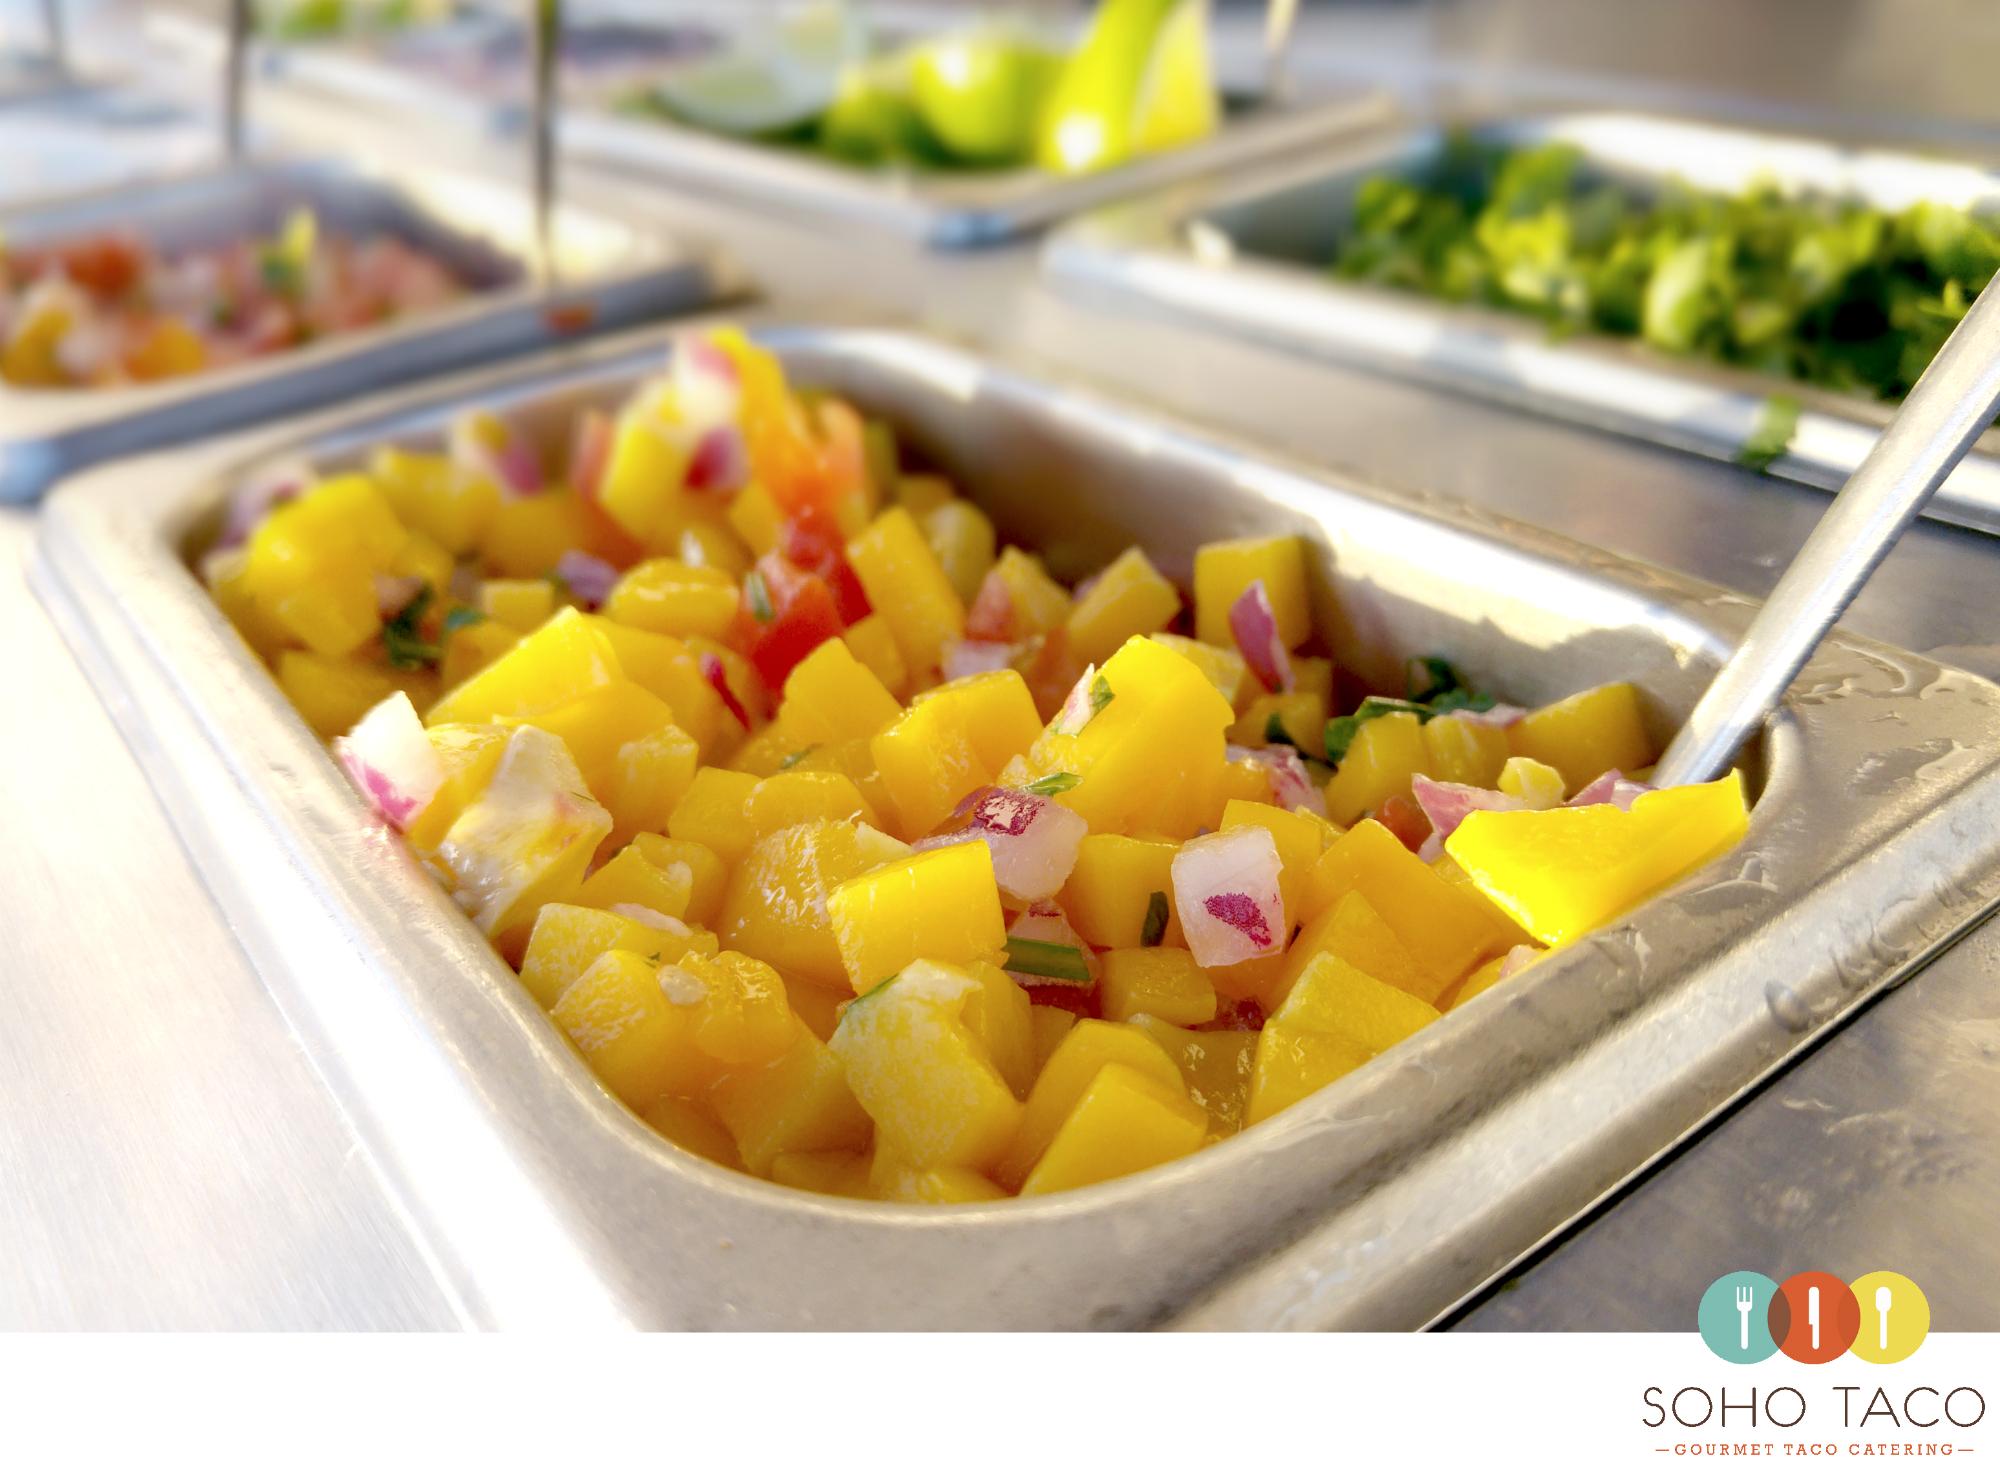 SOHO TACO Gourmet Taco Catering - Wedding - Sunset Beach - Mango Salsa - Orange County - OC